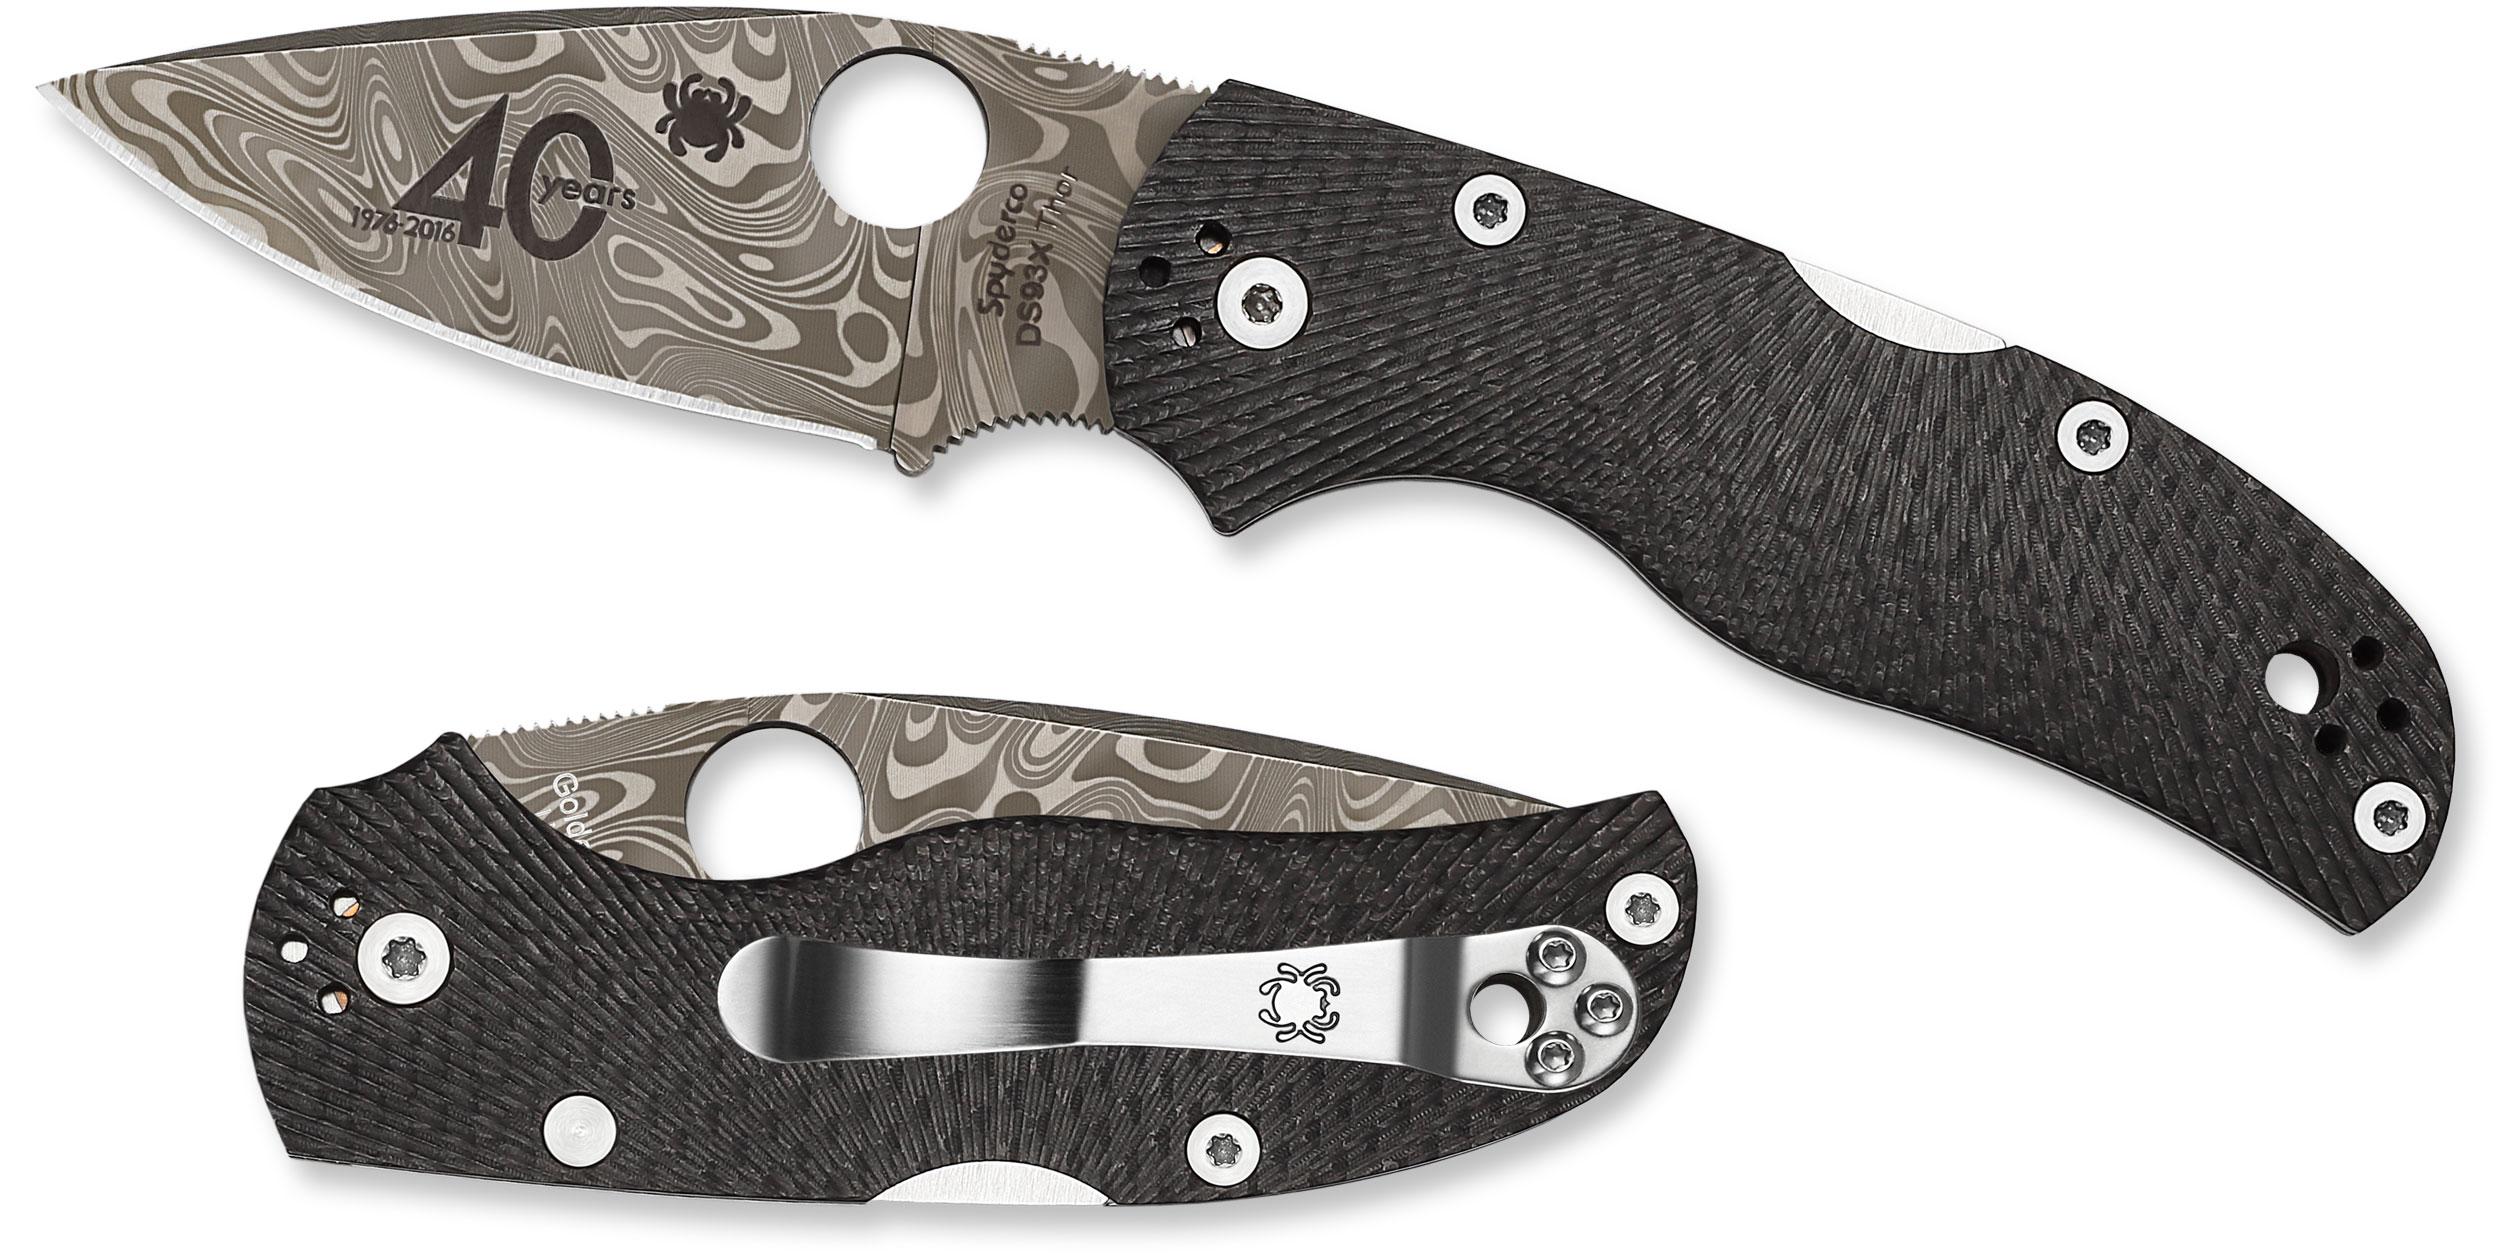 Spyderco C41CF40TH 40th Anniversary Native 5 Folding Knife 2.98 inch Damasteel Blade, Fluted Carbon Fiber Handles, Sprint Run